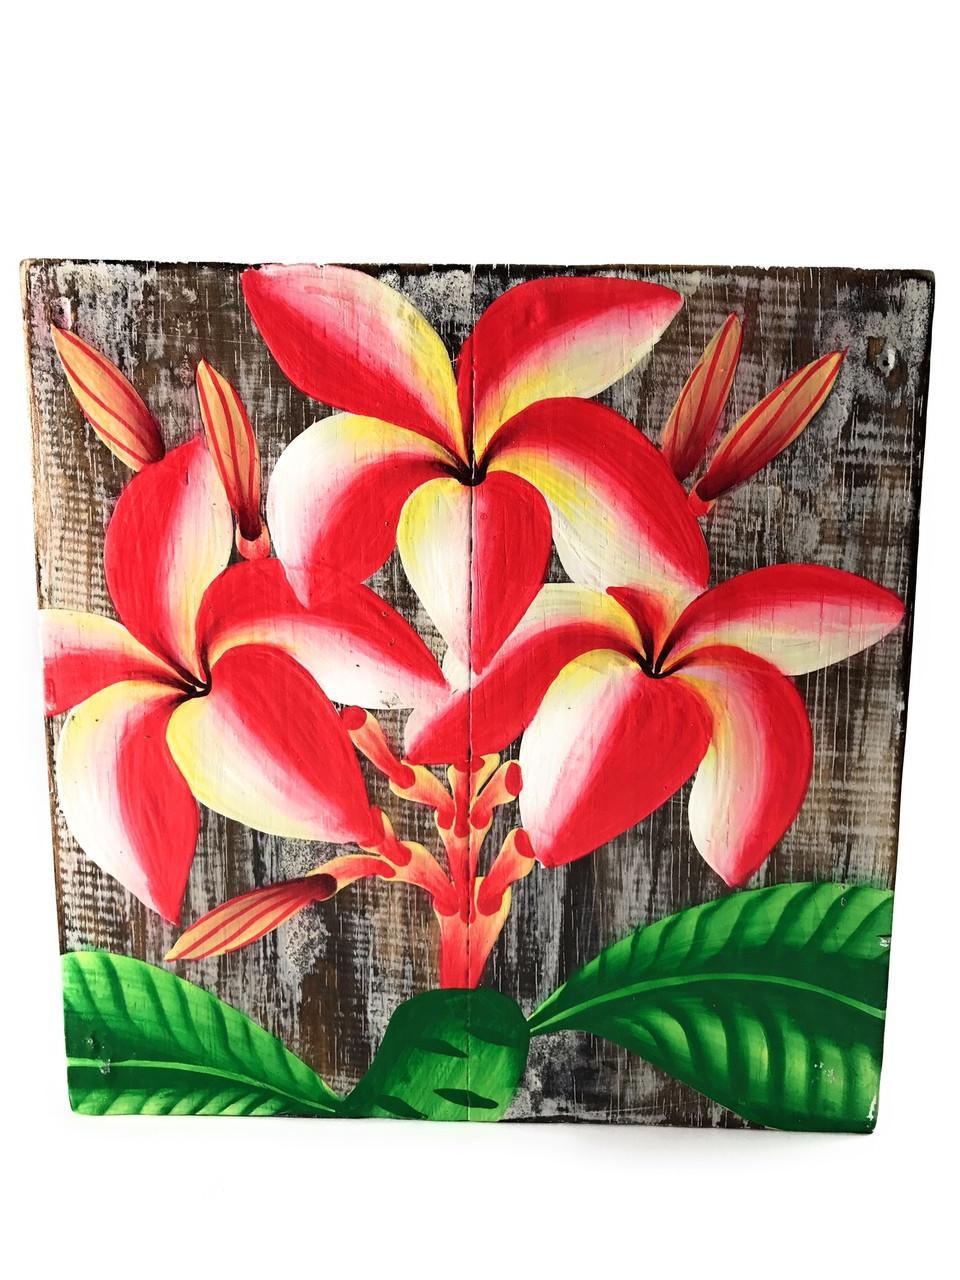 Plumeria Flower Painting On Wood Planks 8 X Rustic Wall Decor